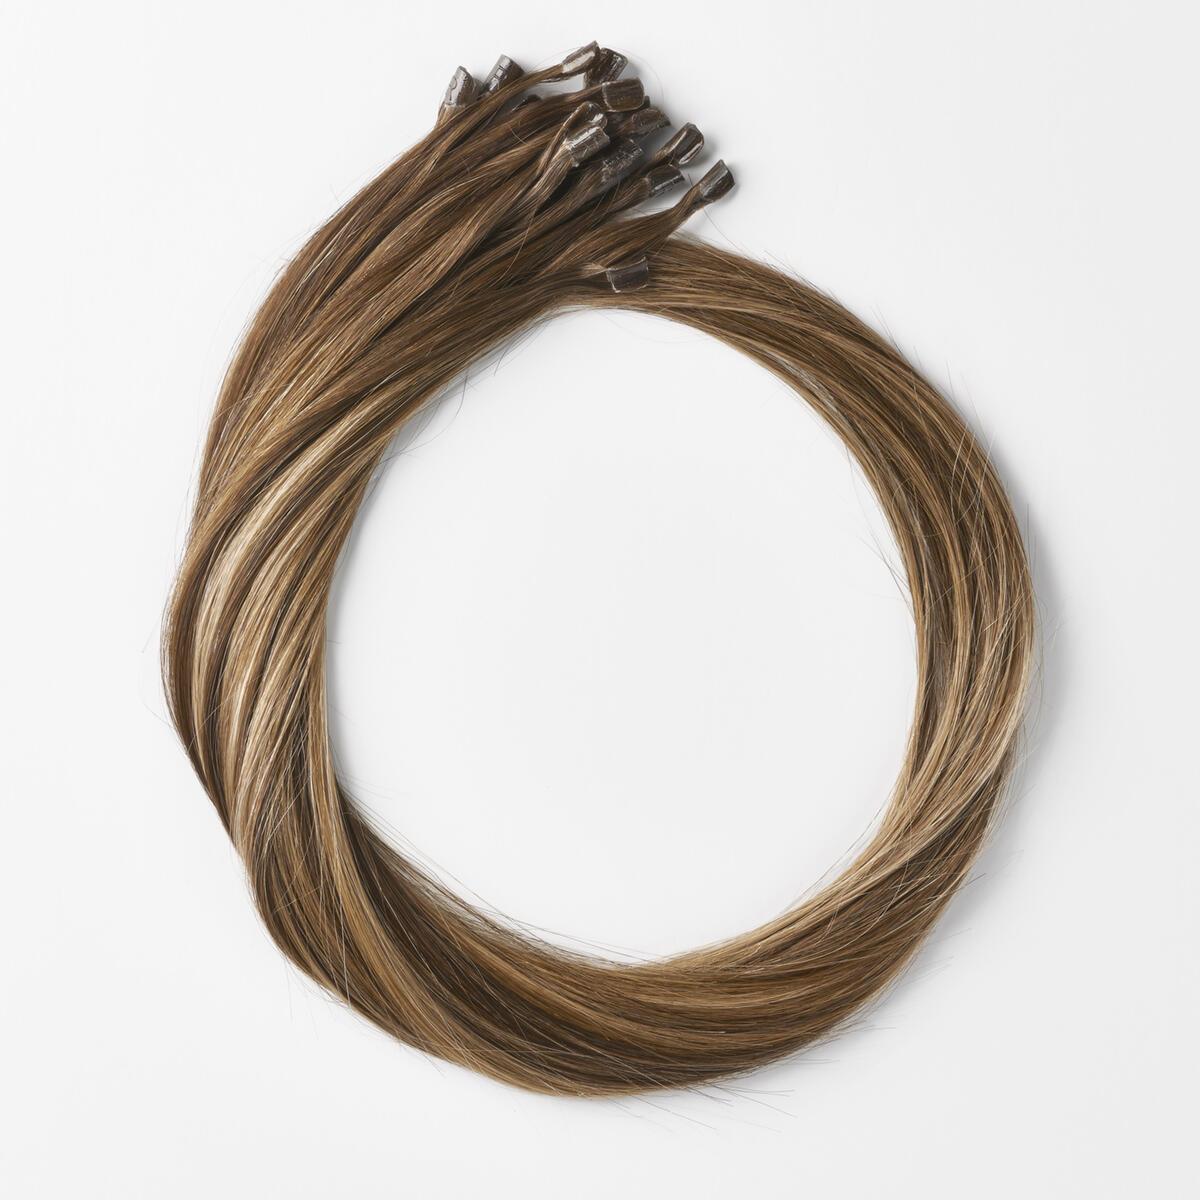 Bondings Premium Glatt B2.3/5.0 Hazelnut Caramel Balayage 50 cm